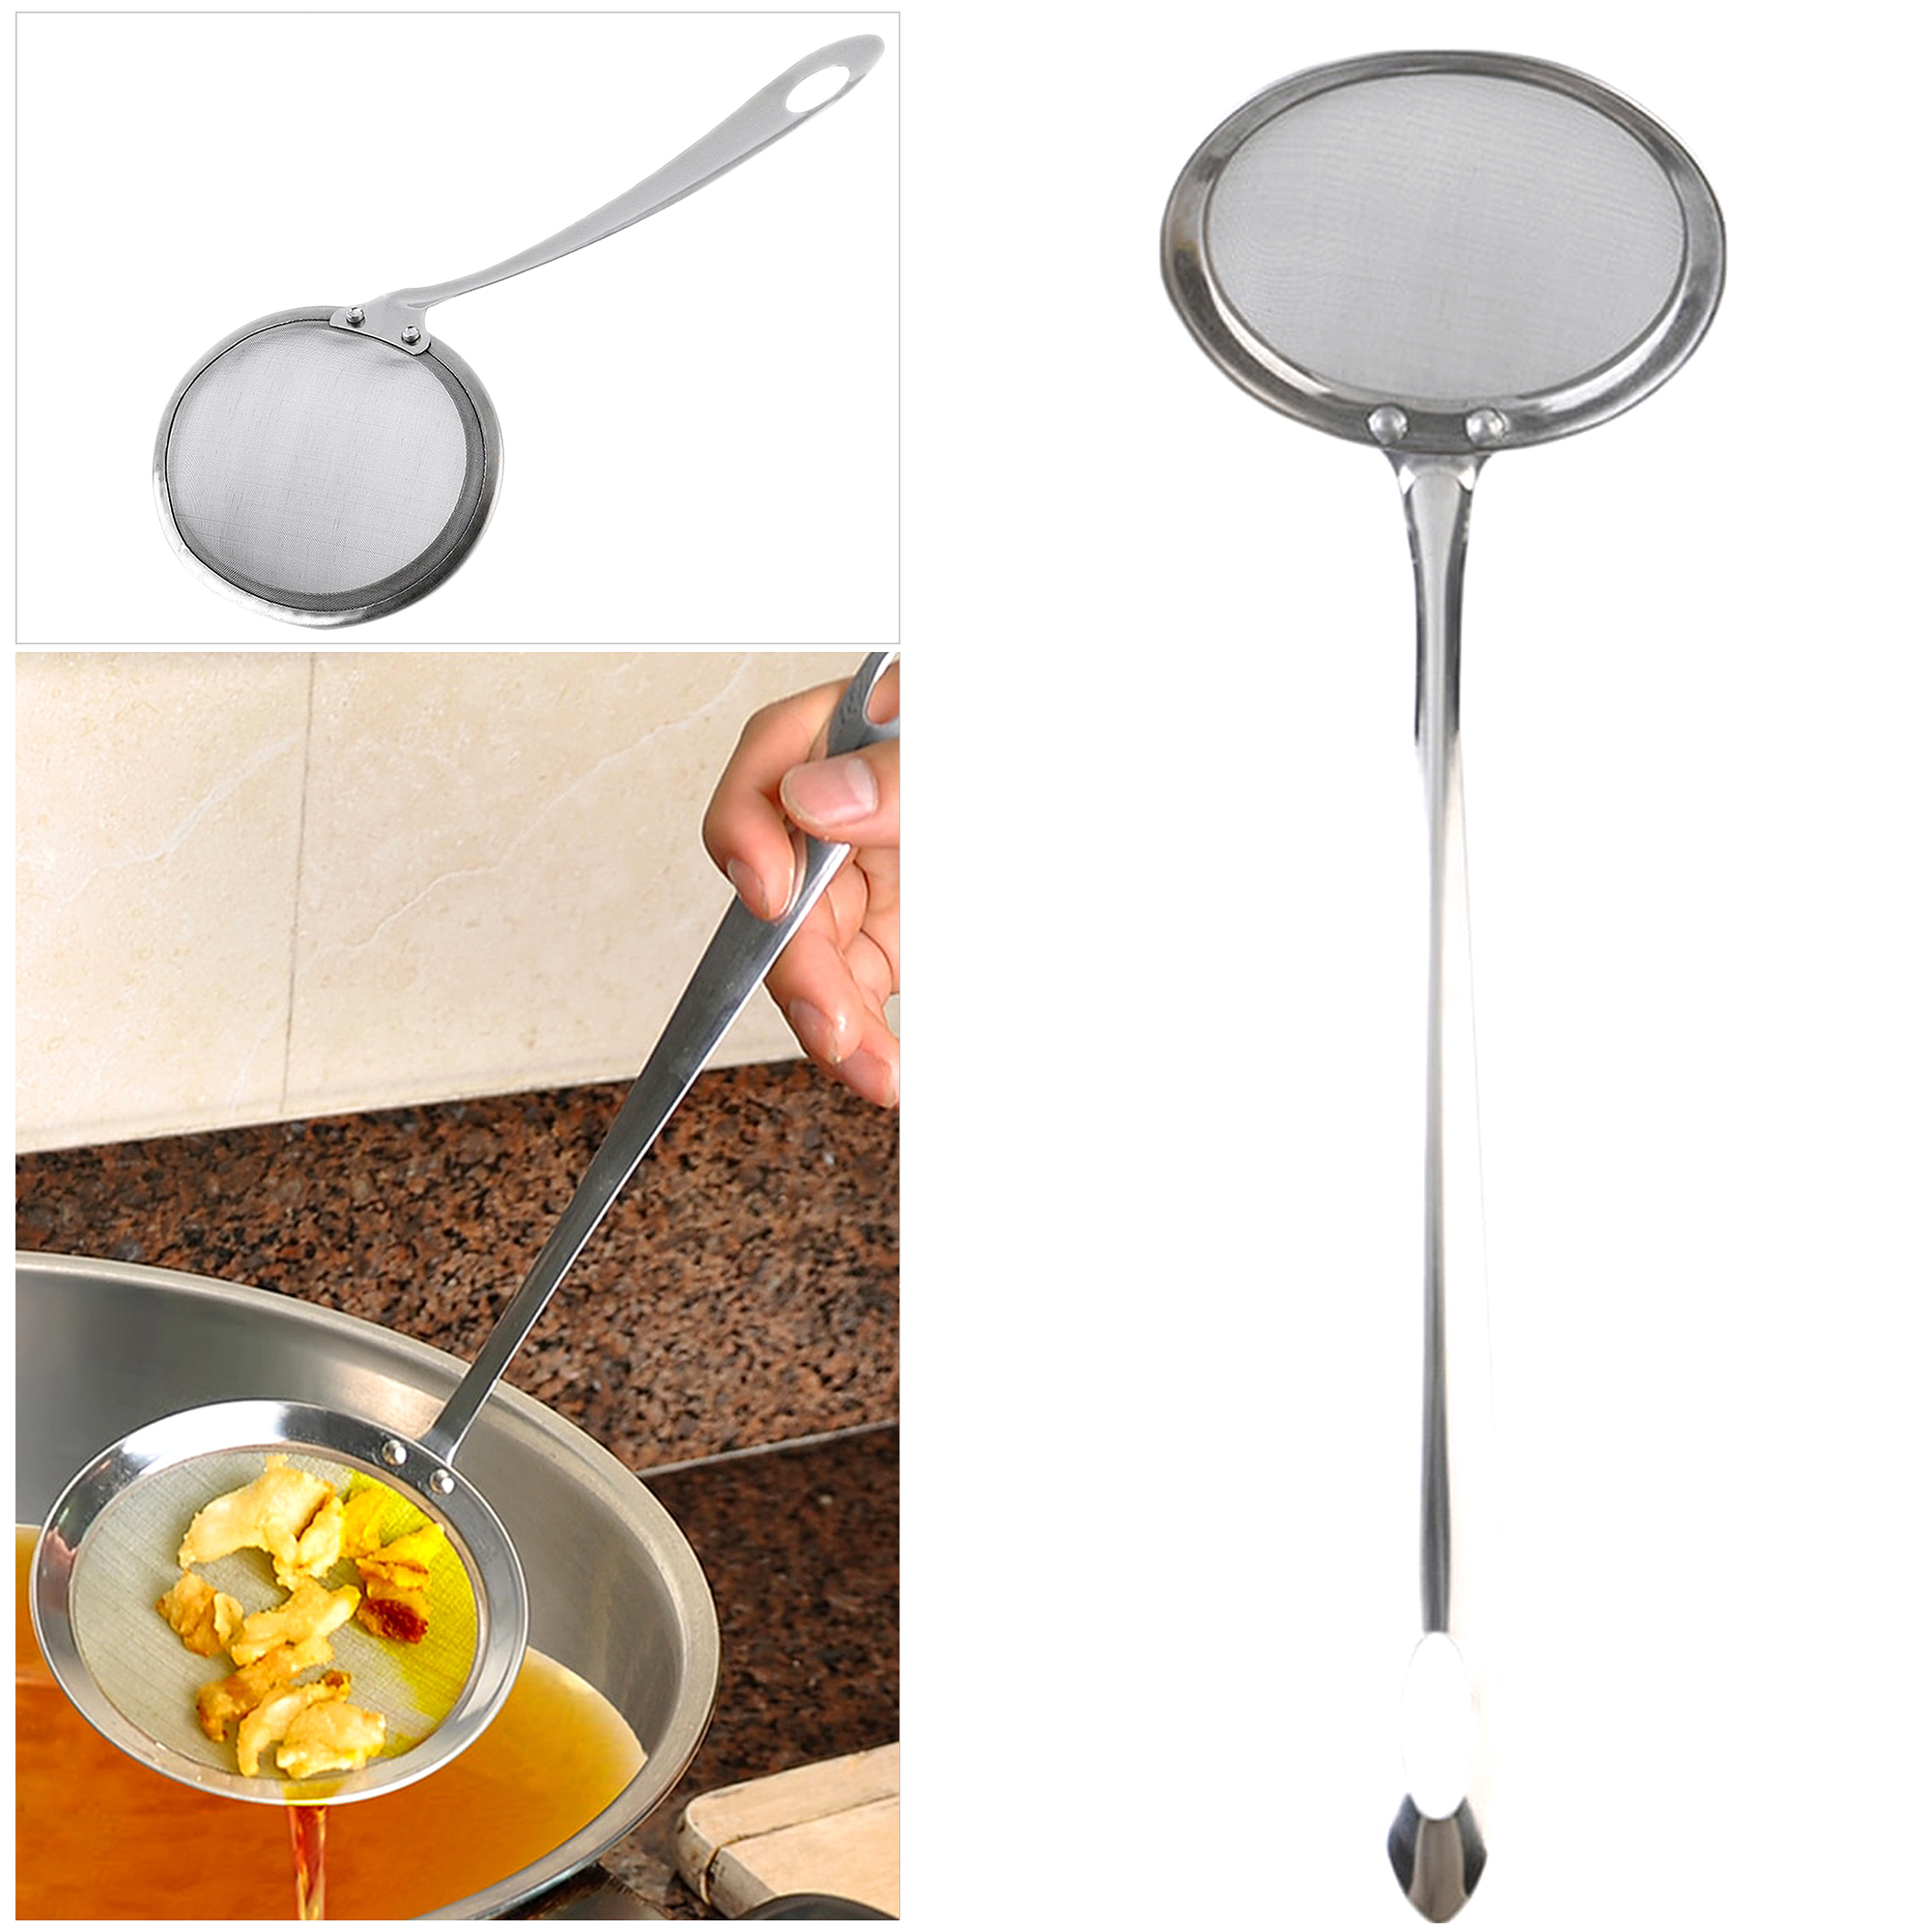 Stainless Steel Fine Mesh Skimmer Flour Colander Sieve Sifter Oil Strainer Filter Colander Spoon Kitchen Cooking Tools for Hot Pot